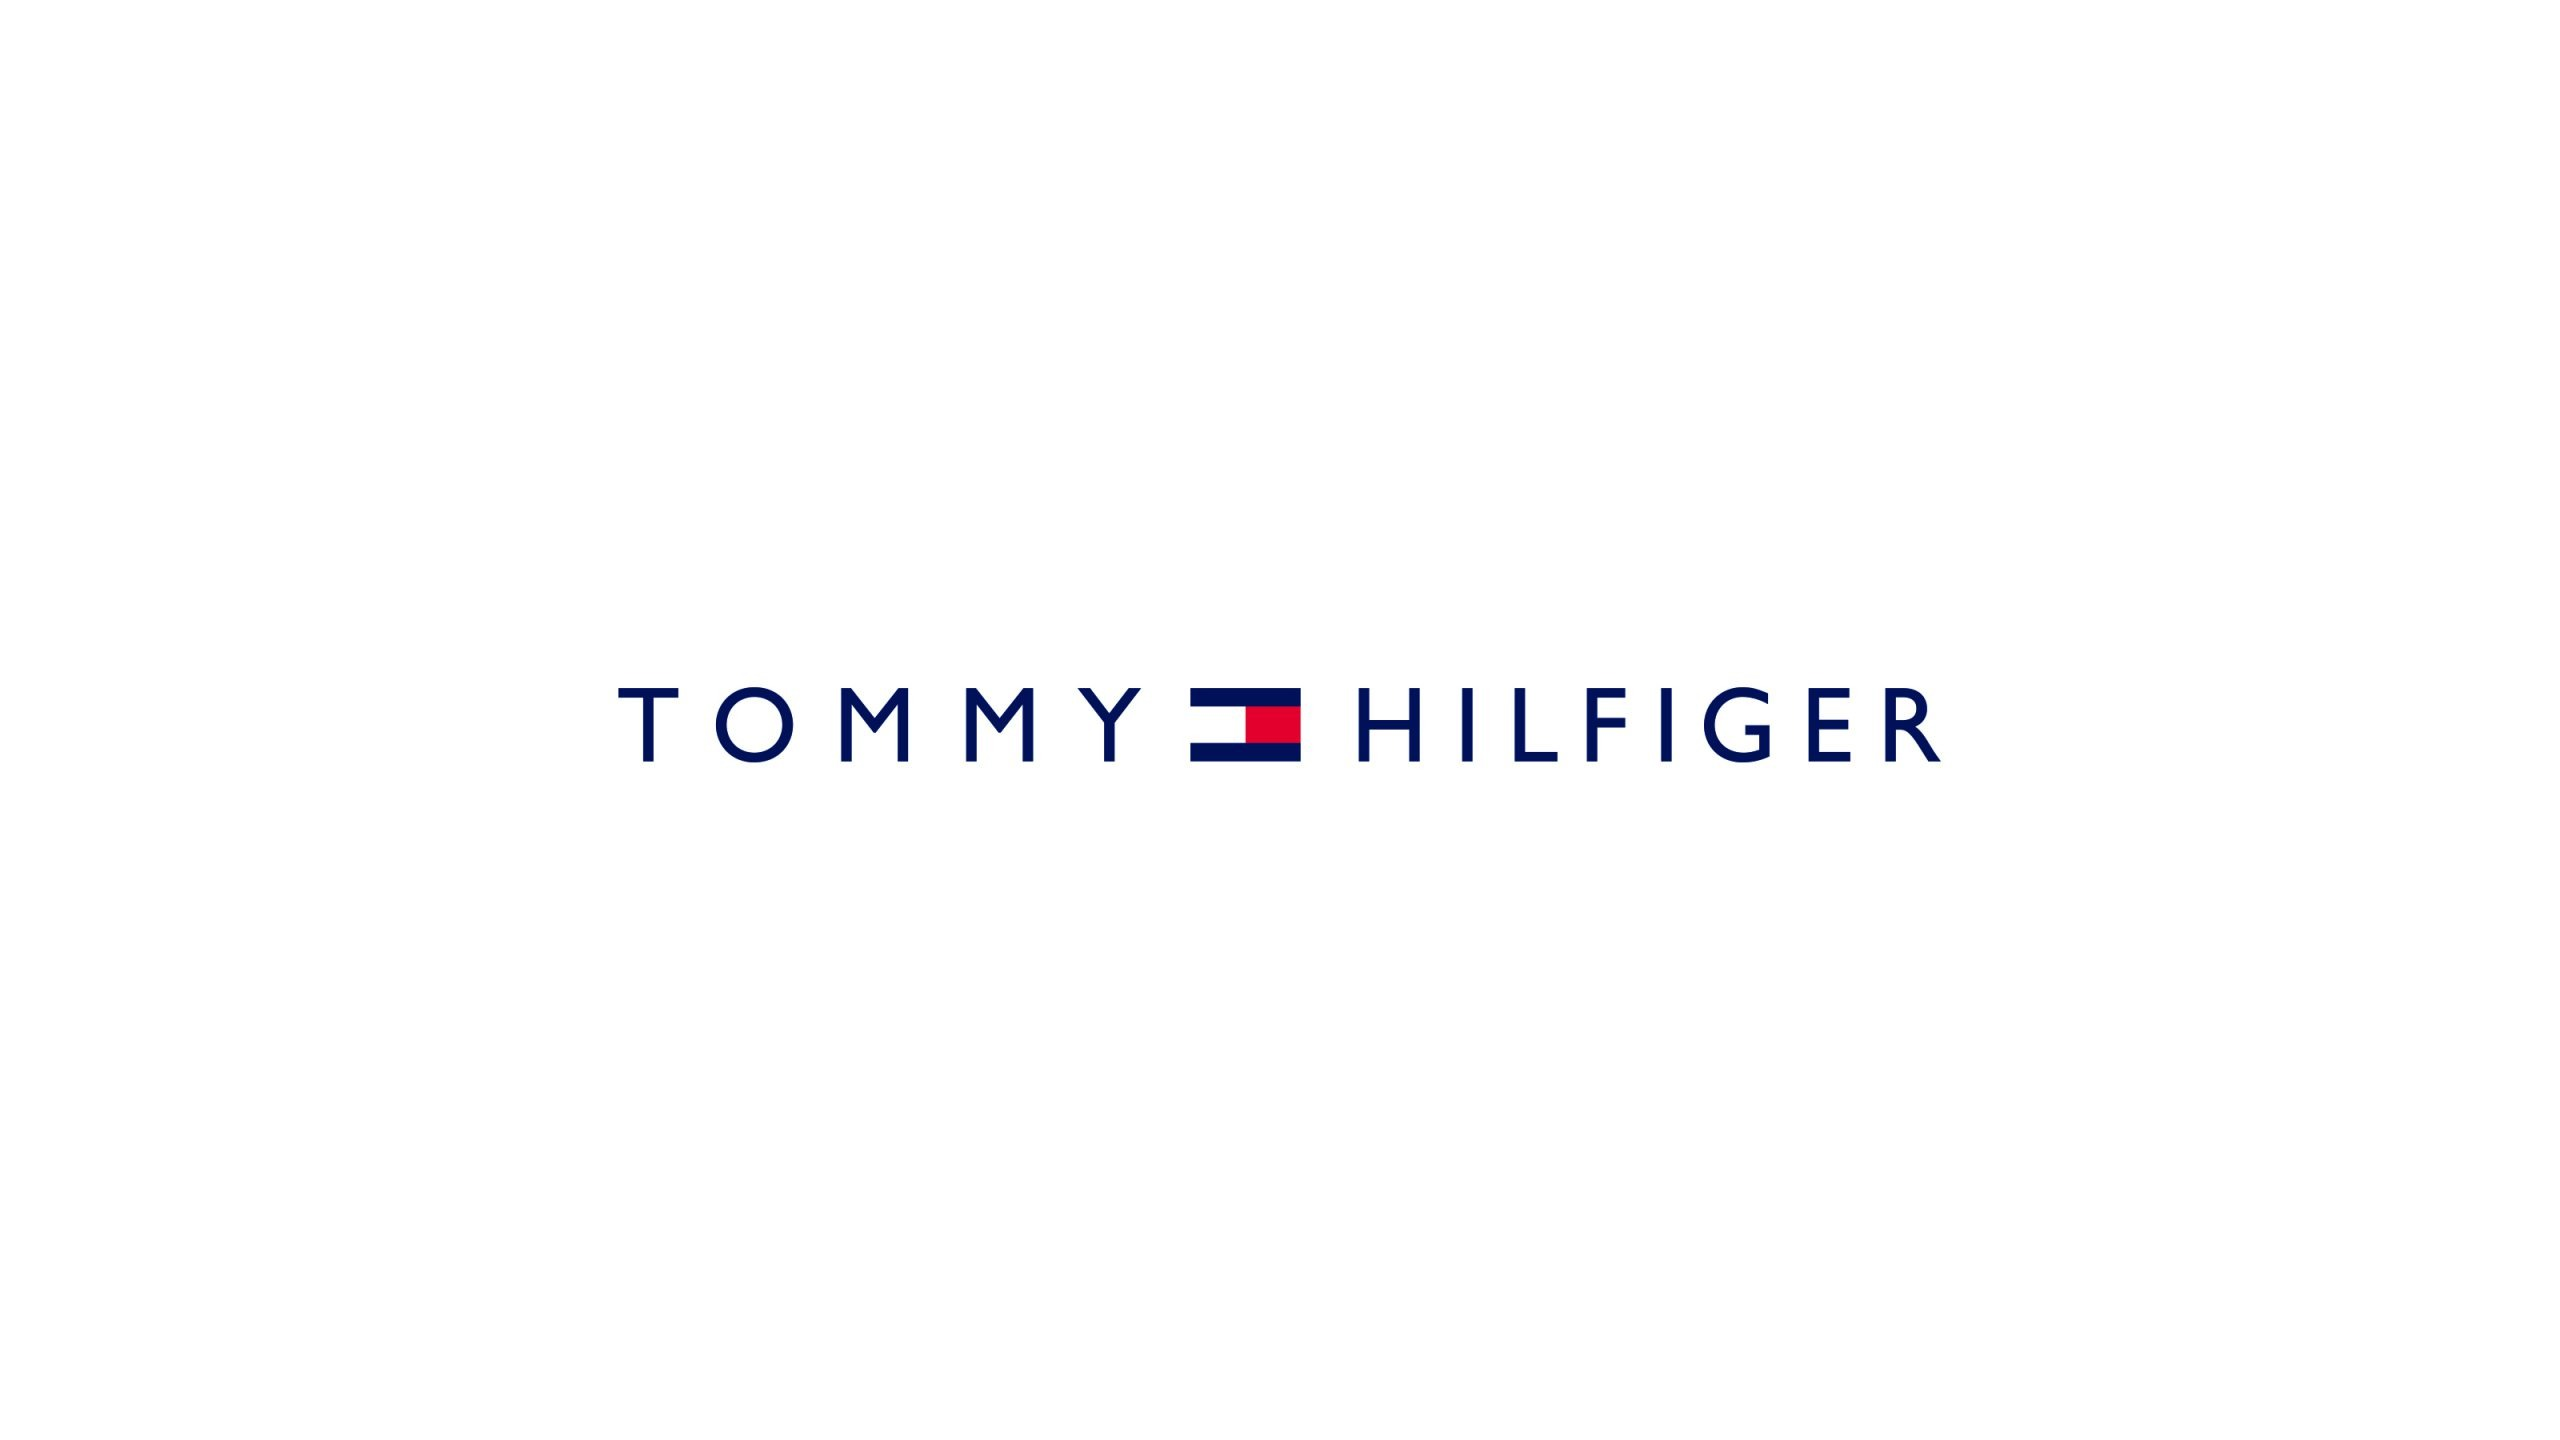 Tommy Hilfiger @ Pitti Uomo 91